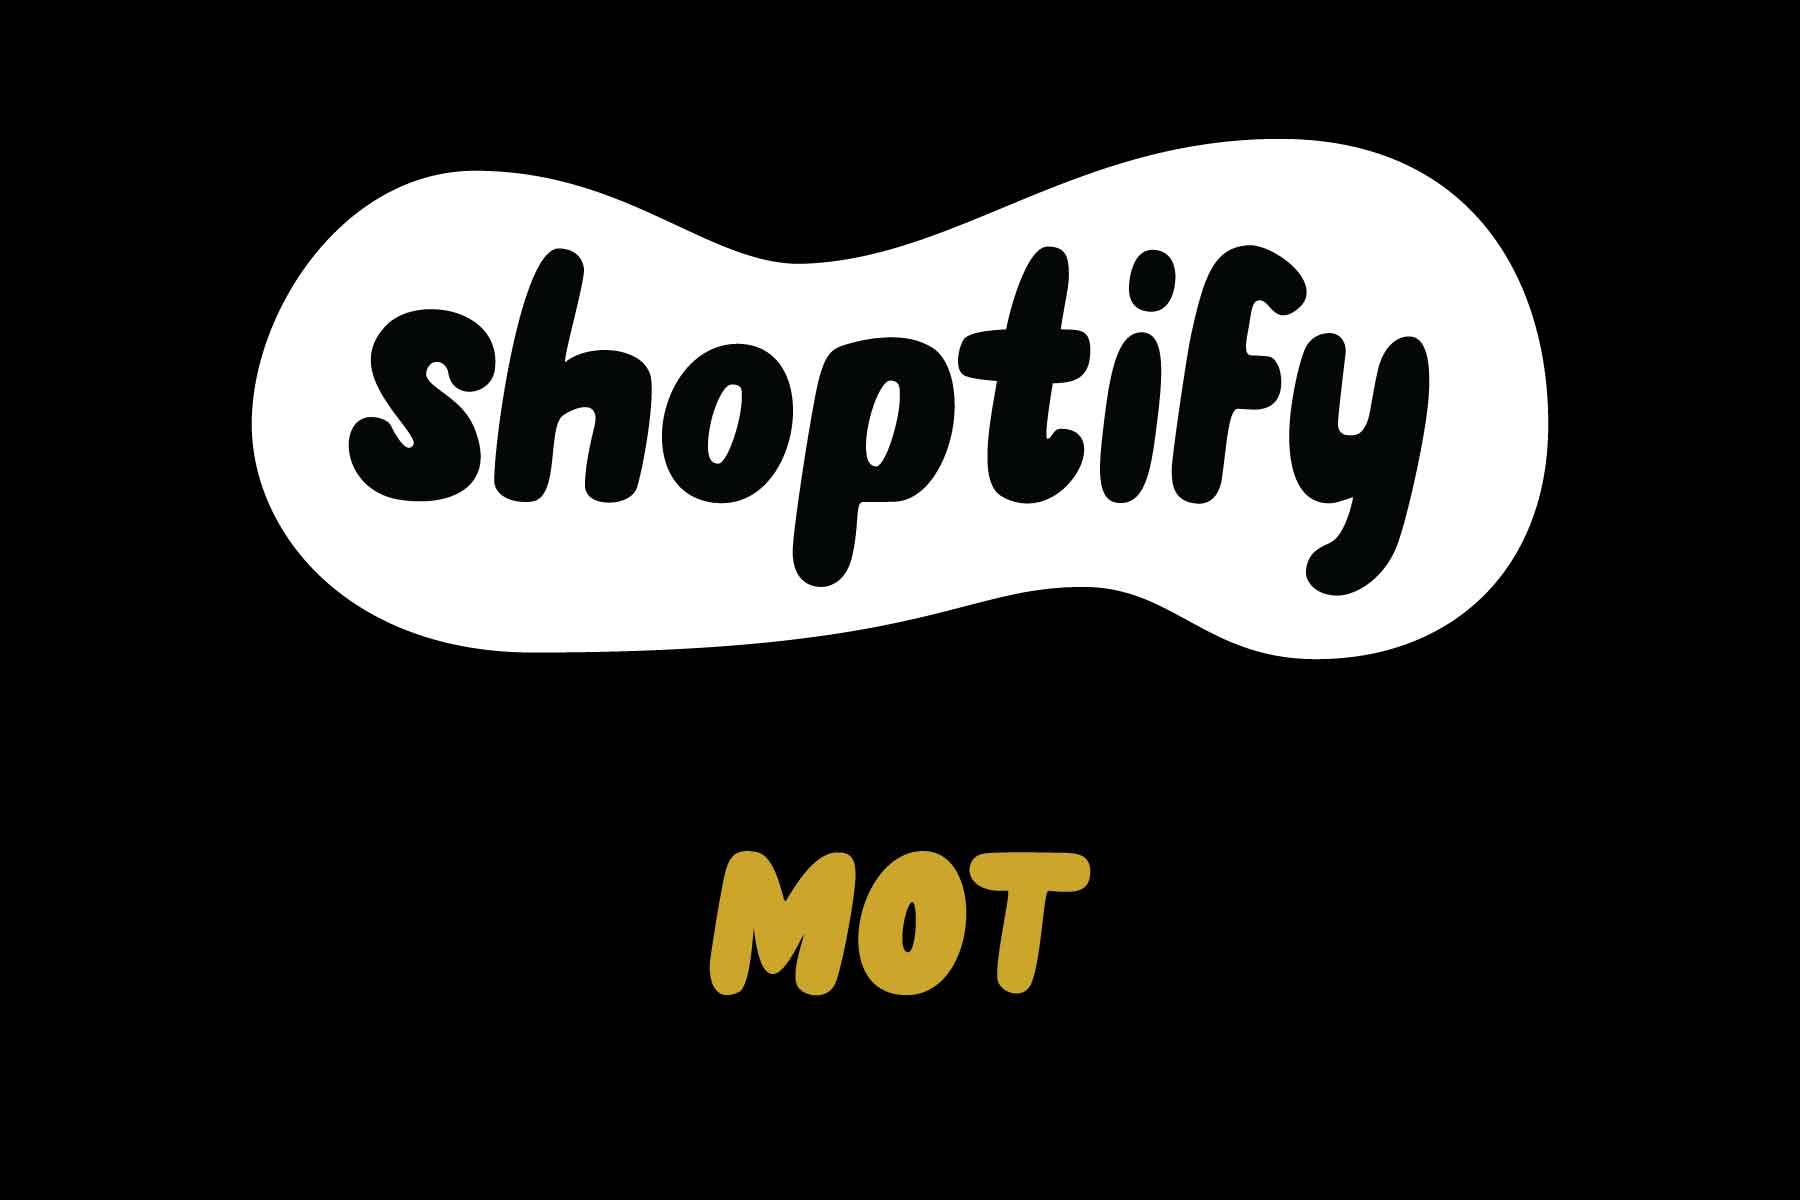 MOT online store service logo.